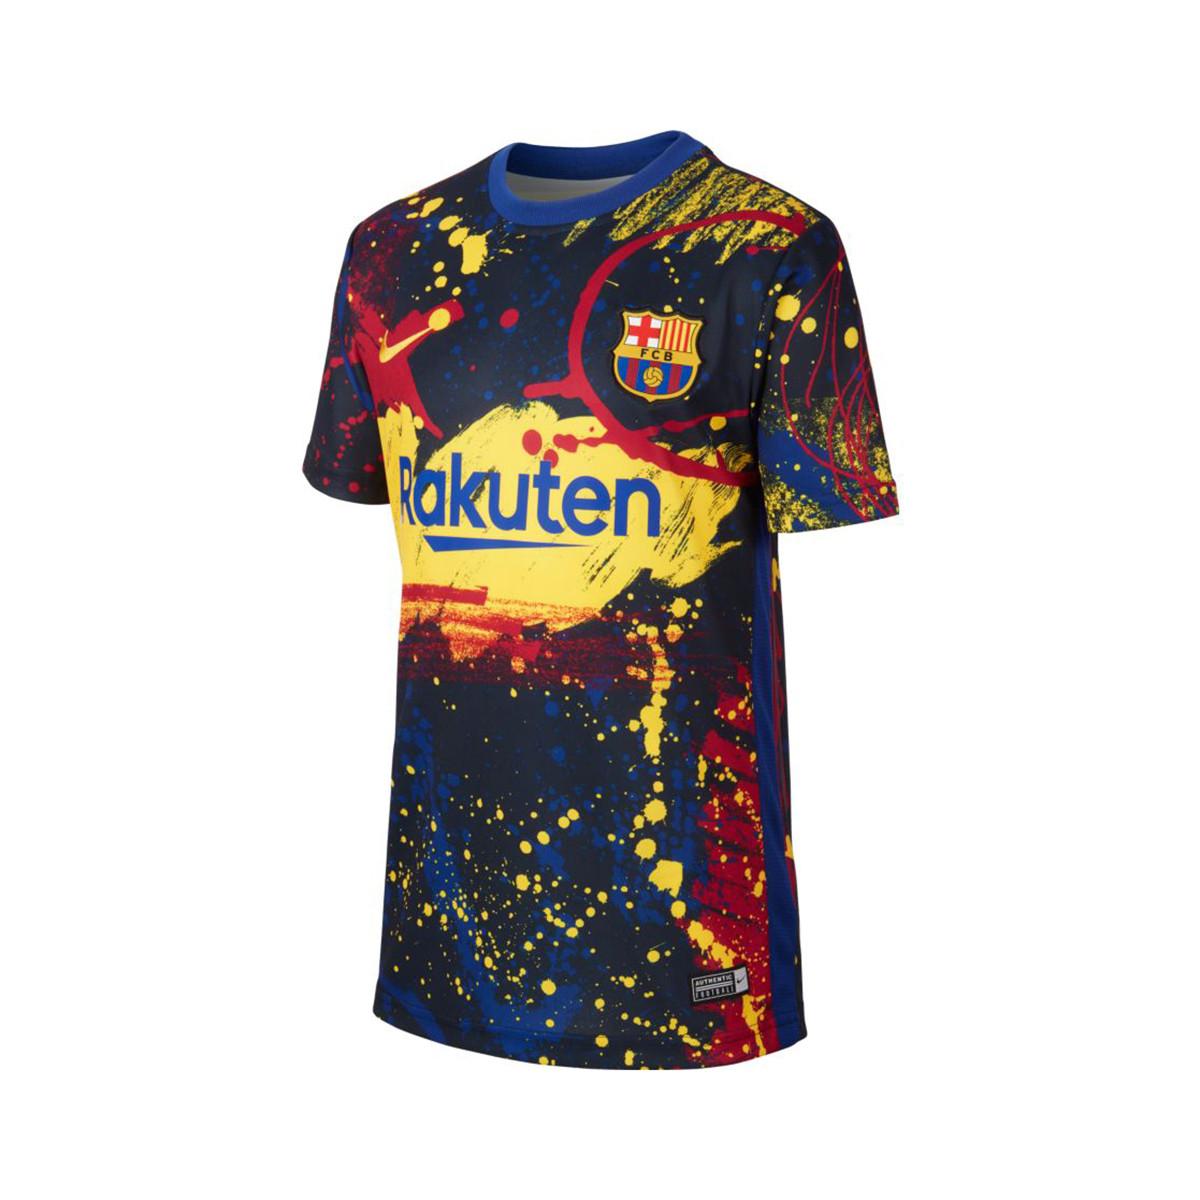 Sueño romano italiano  Jersey Nike FC Barcelona Breathe Pre Match 2019-2020 Niño Dark  obsidian-Deep royal blue - Football store Fútbol Emotion